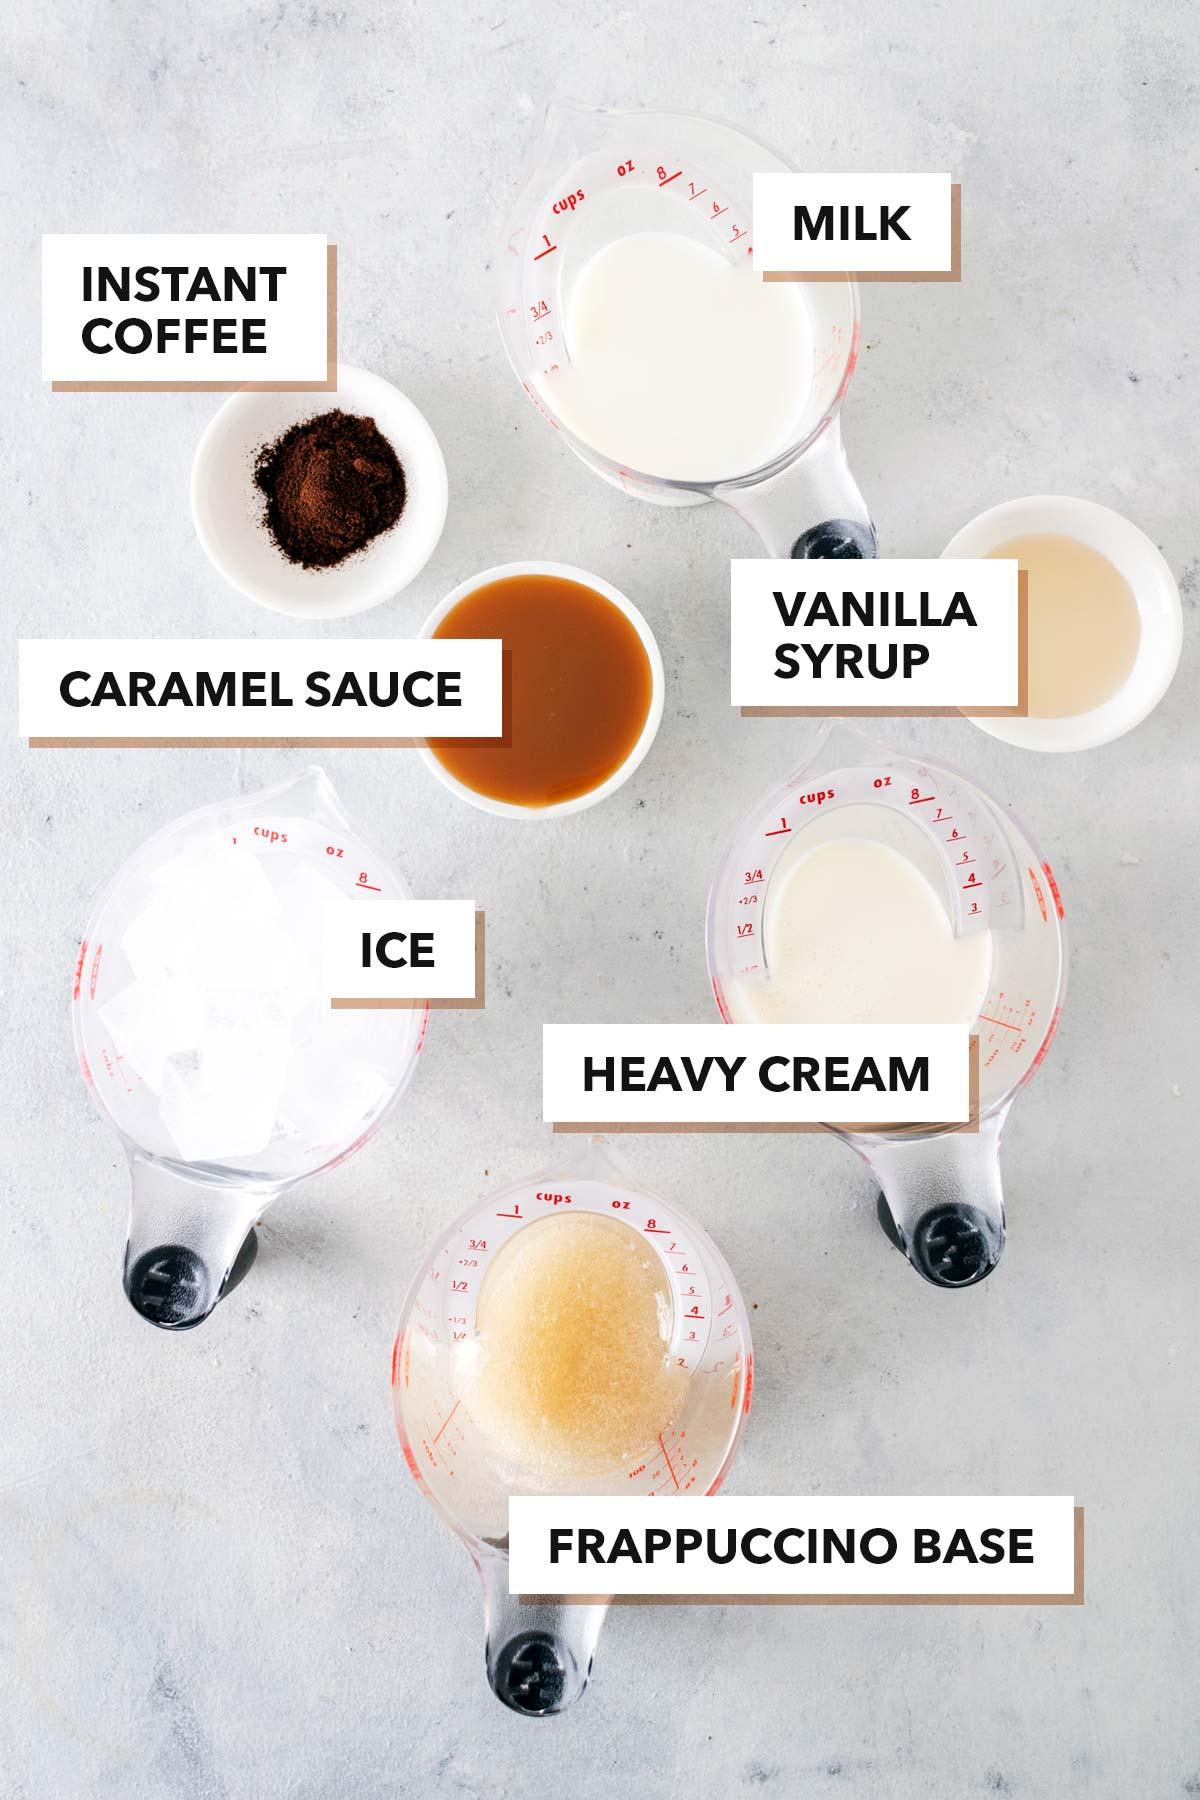 Starbucks Caramel Frappuccino copycat recipe ingredients.